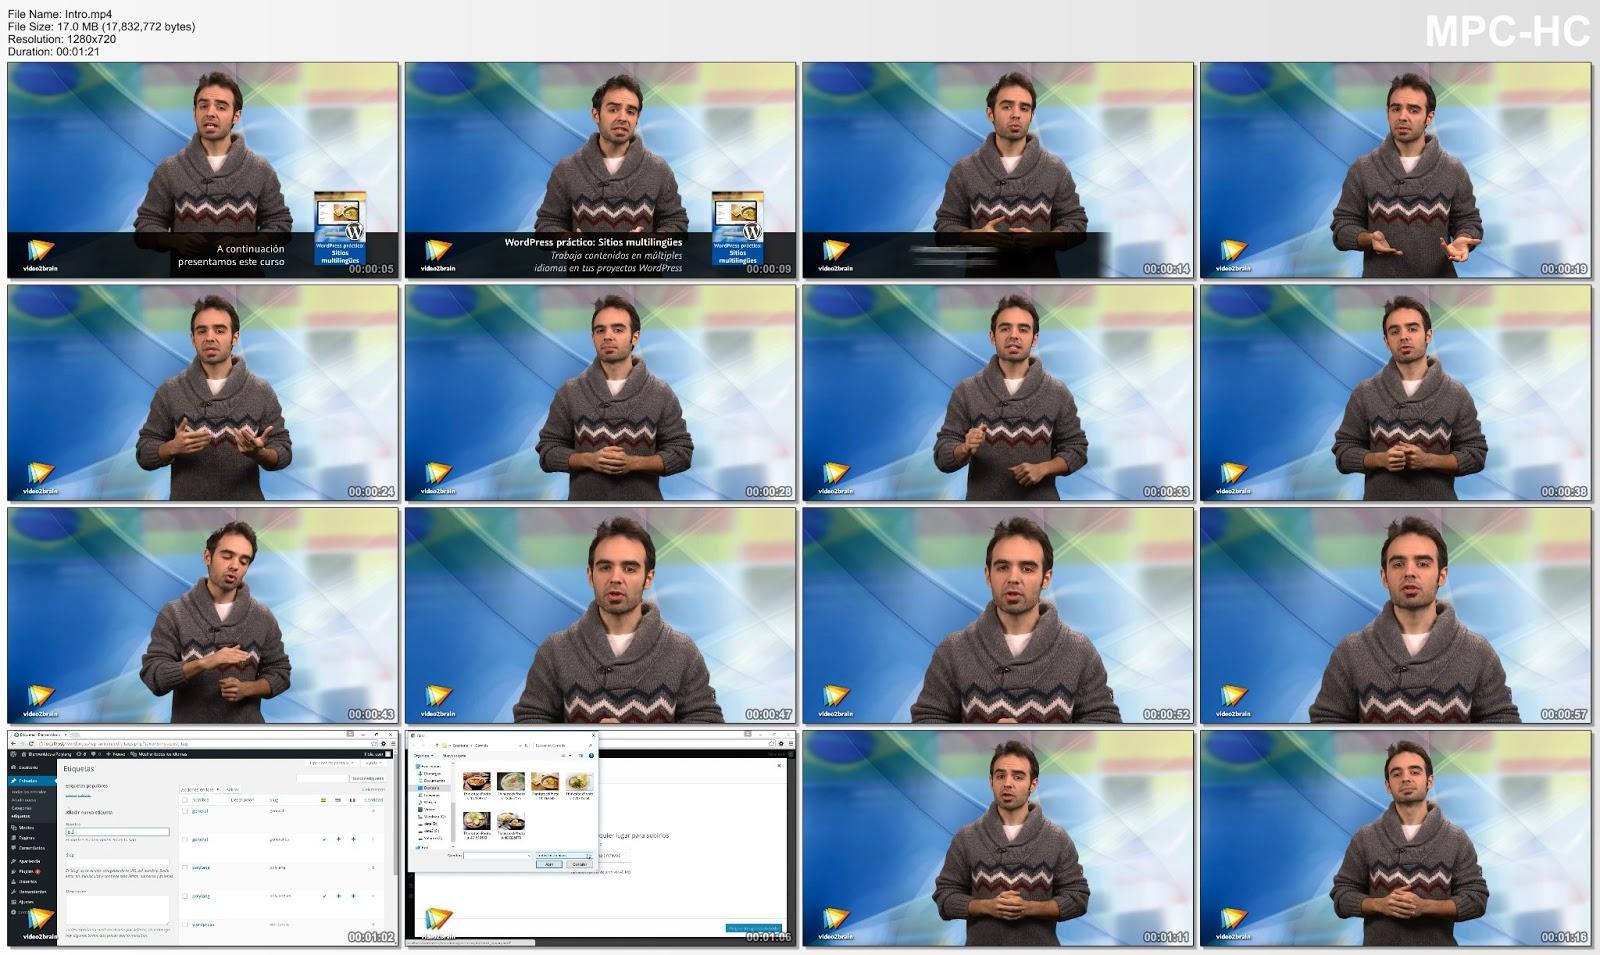 Miniaturas de un vídeo del curso